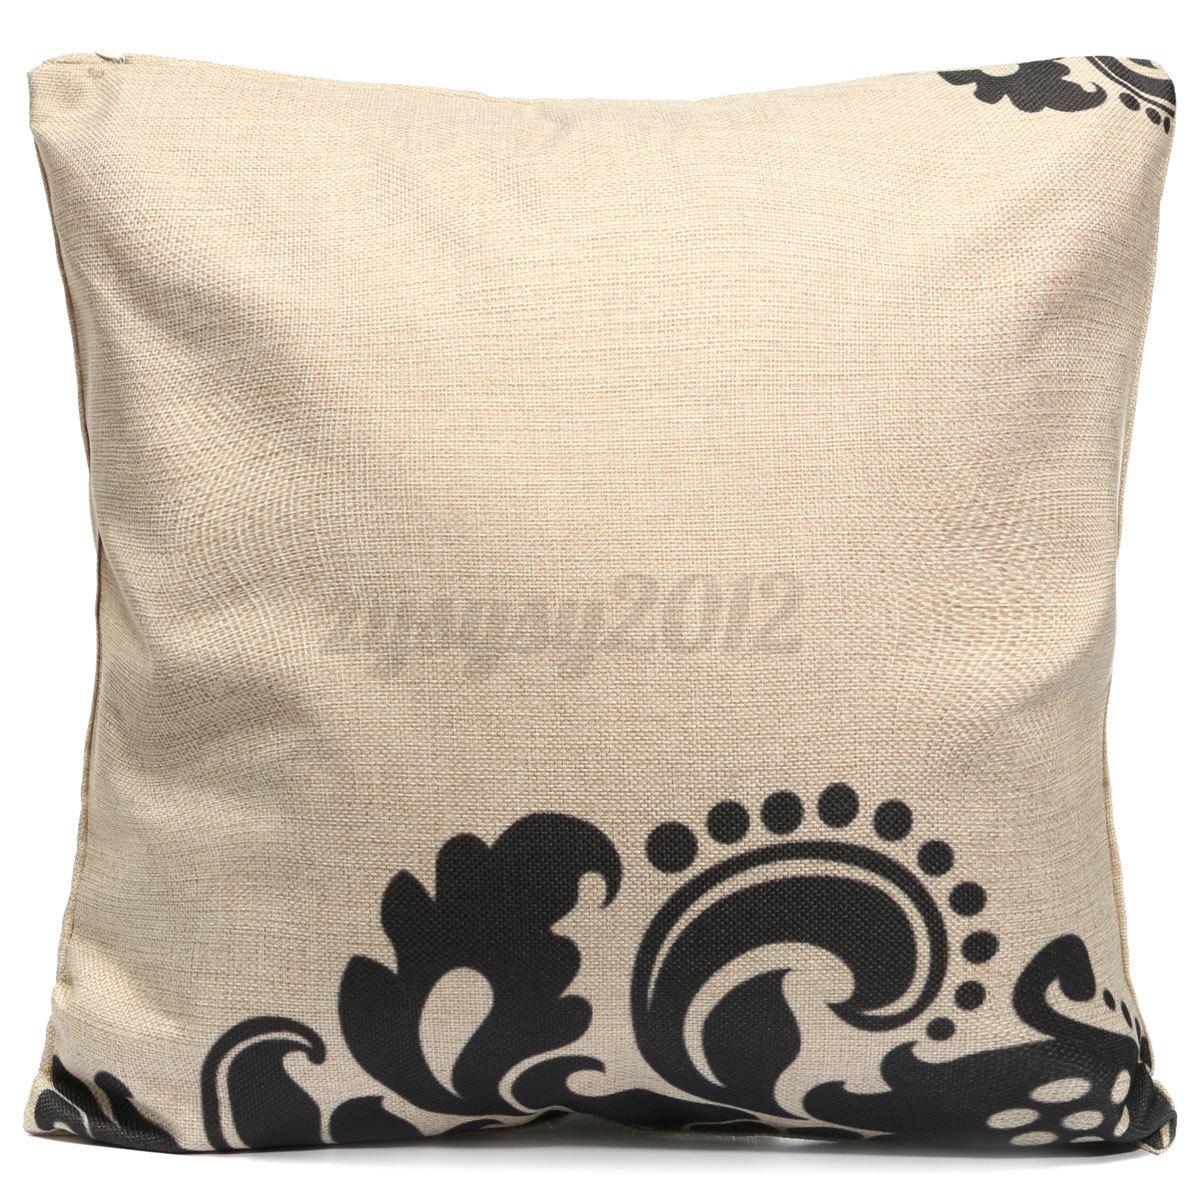 Black Linen Throw Pillows : Vintage Black White Cotton Linen Throw Cushion Cover Pillow Case Home Decor Y eBay